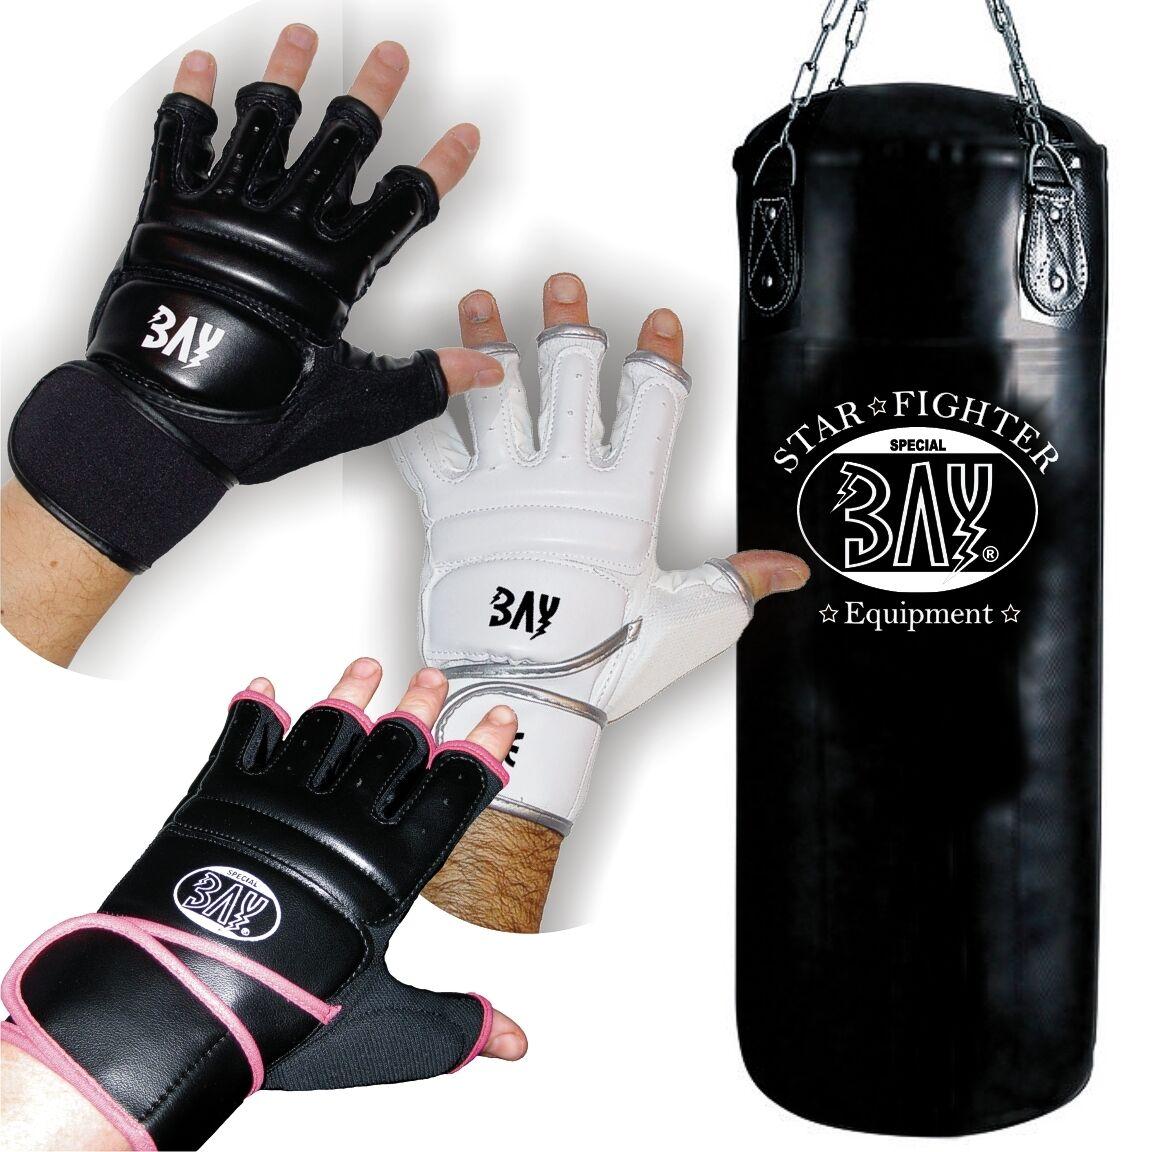 BAY® STAR-FIT Boxset 80 cm gefüllt Sandsack Box-Handschuhe Boxsack Box-Set voll